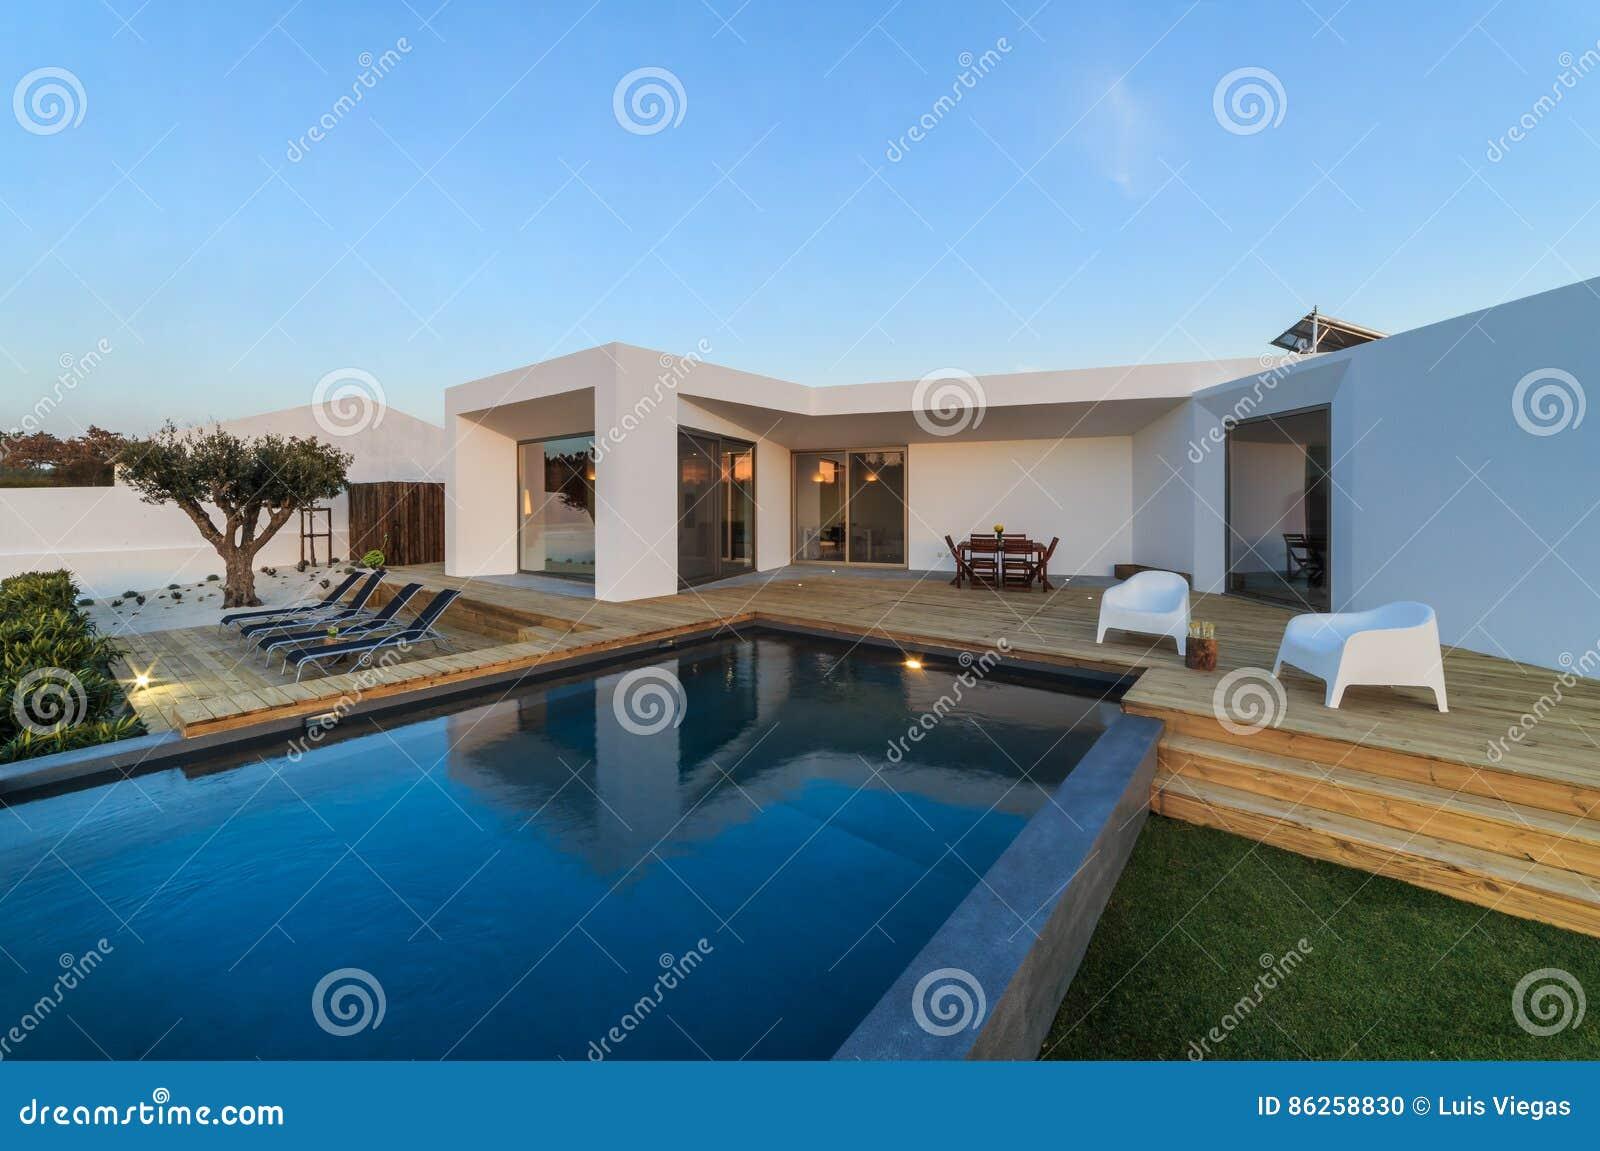 Casa moderna con la piscina del giardino e la piattaforma for Casa moderna blanca con piscina